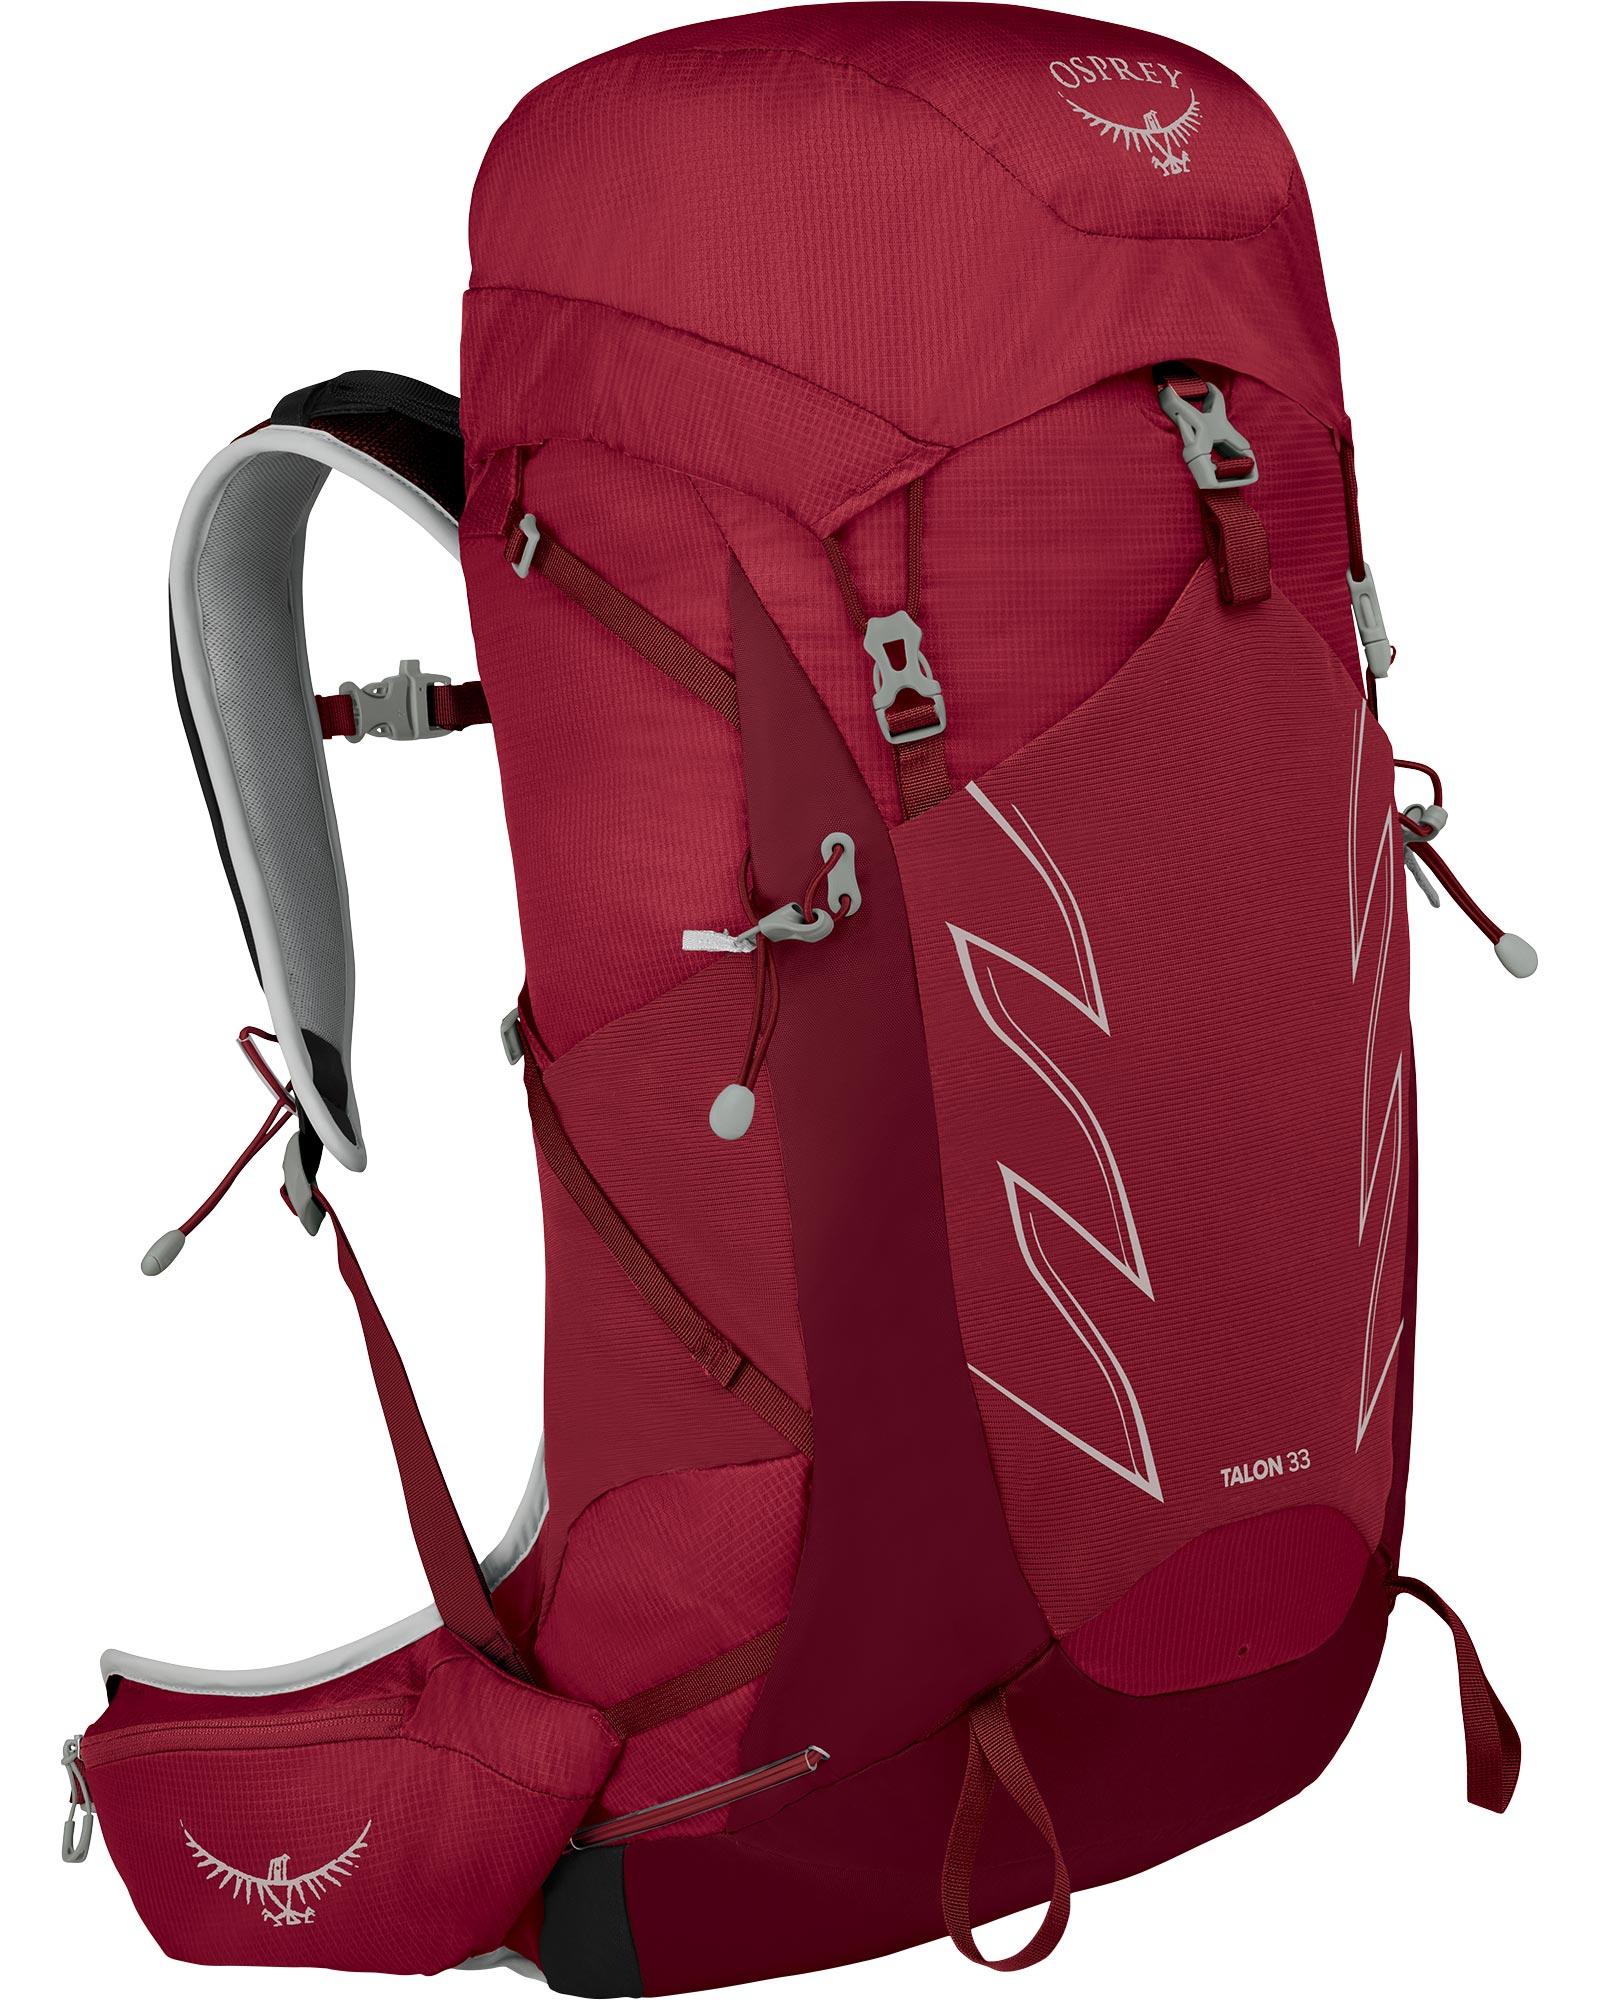 Osprey Men's Talon 33 Backpack 0